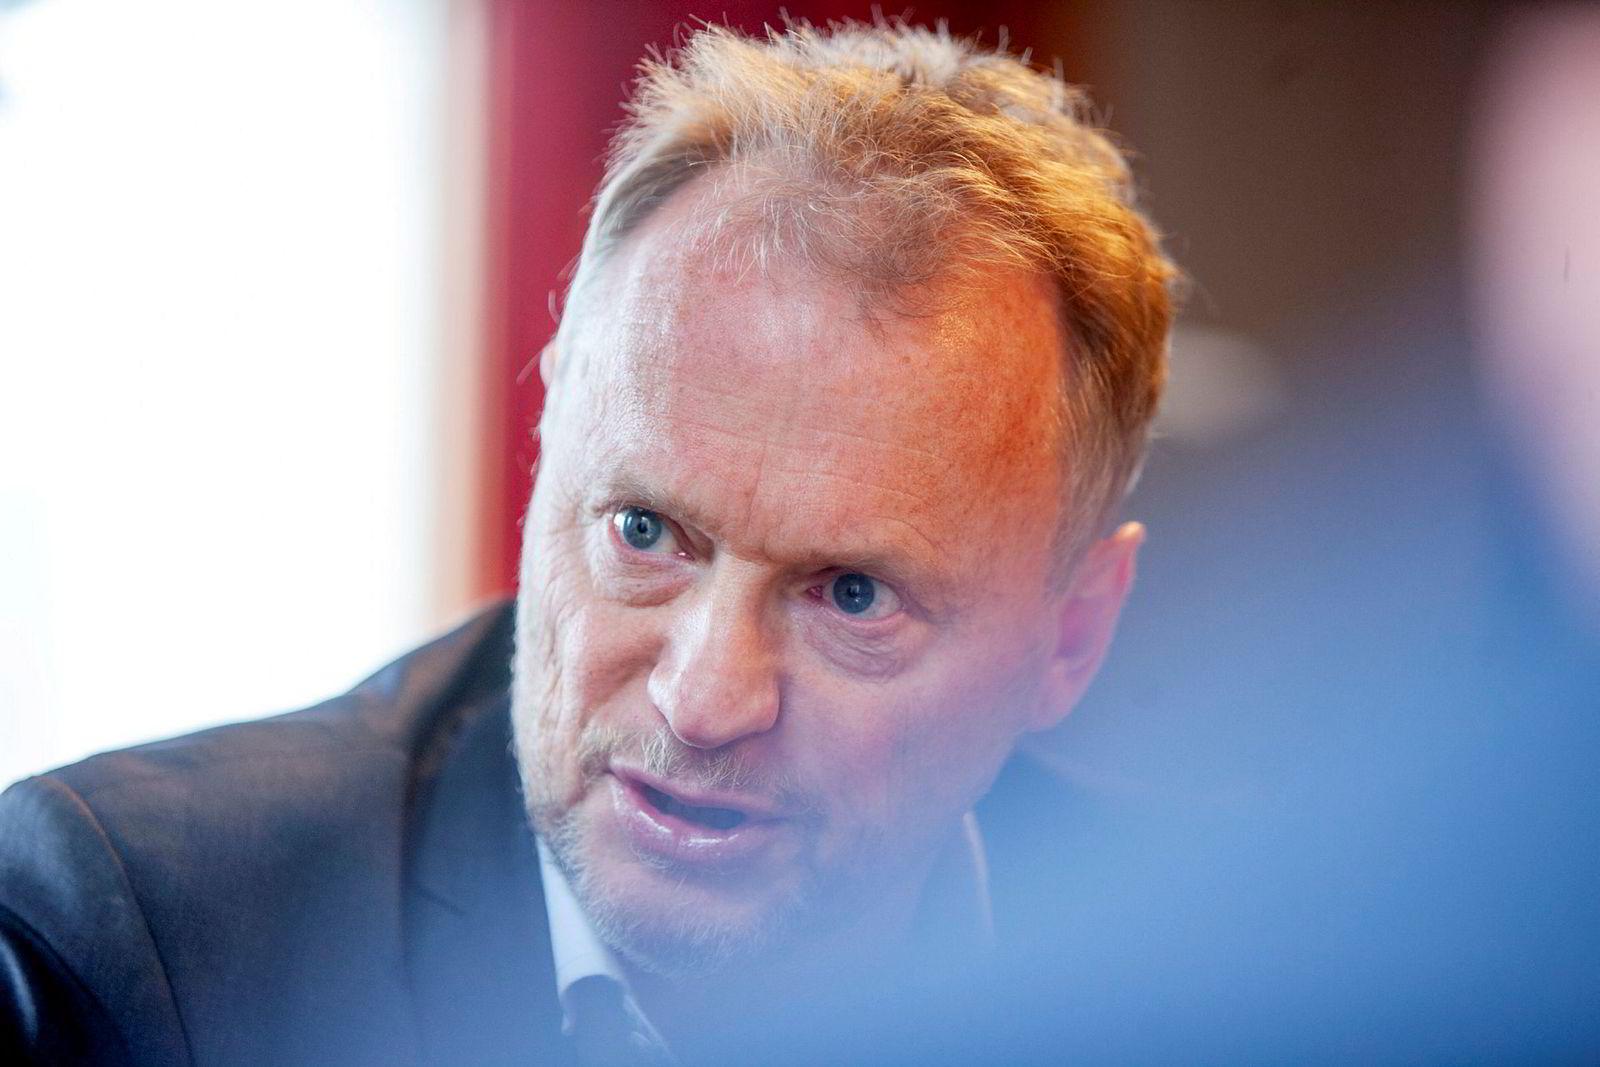 Byrådsleder Raymond Johansen mener Hans Geelmuyden brenner broer.